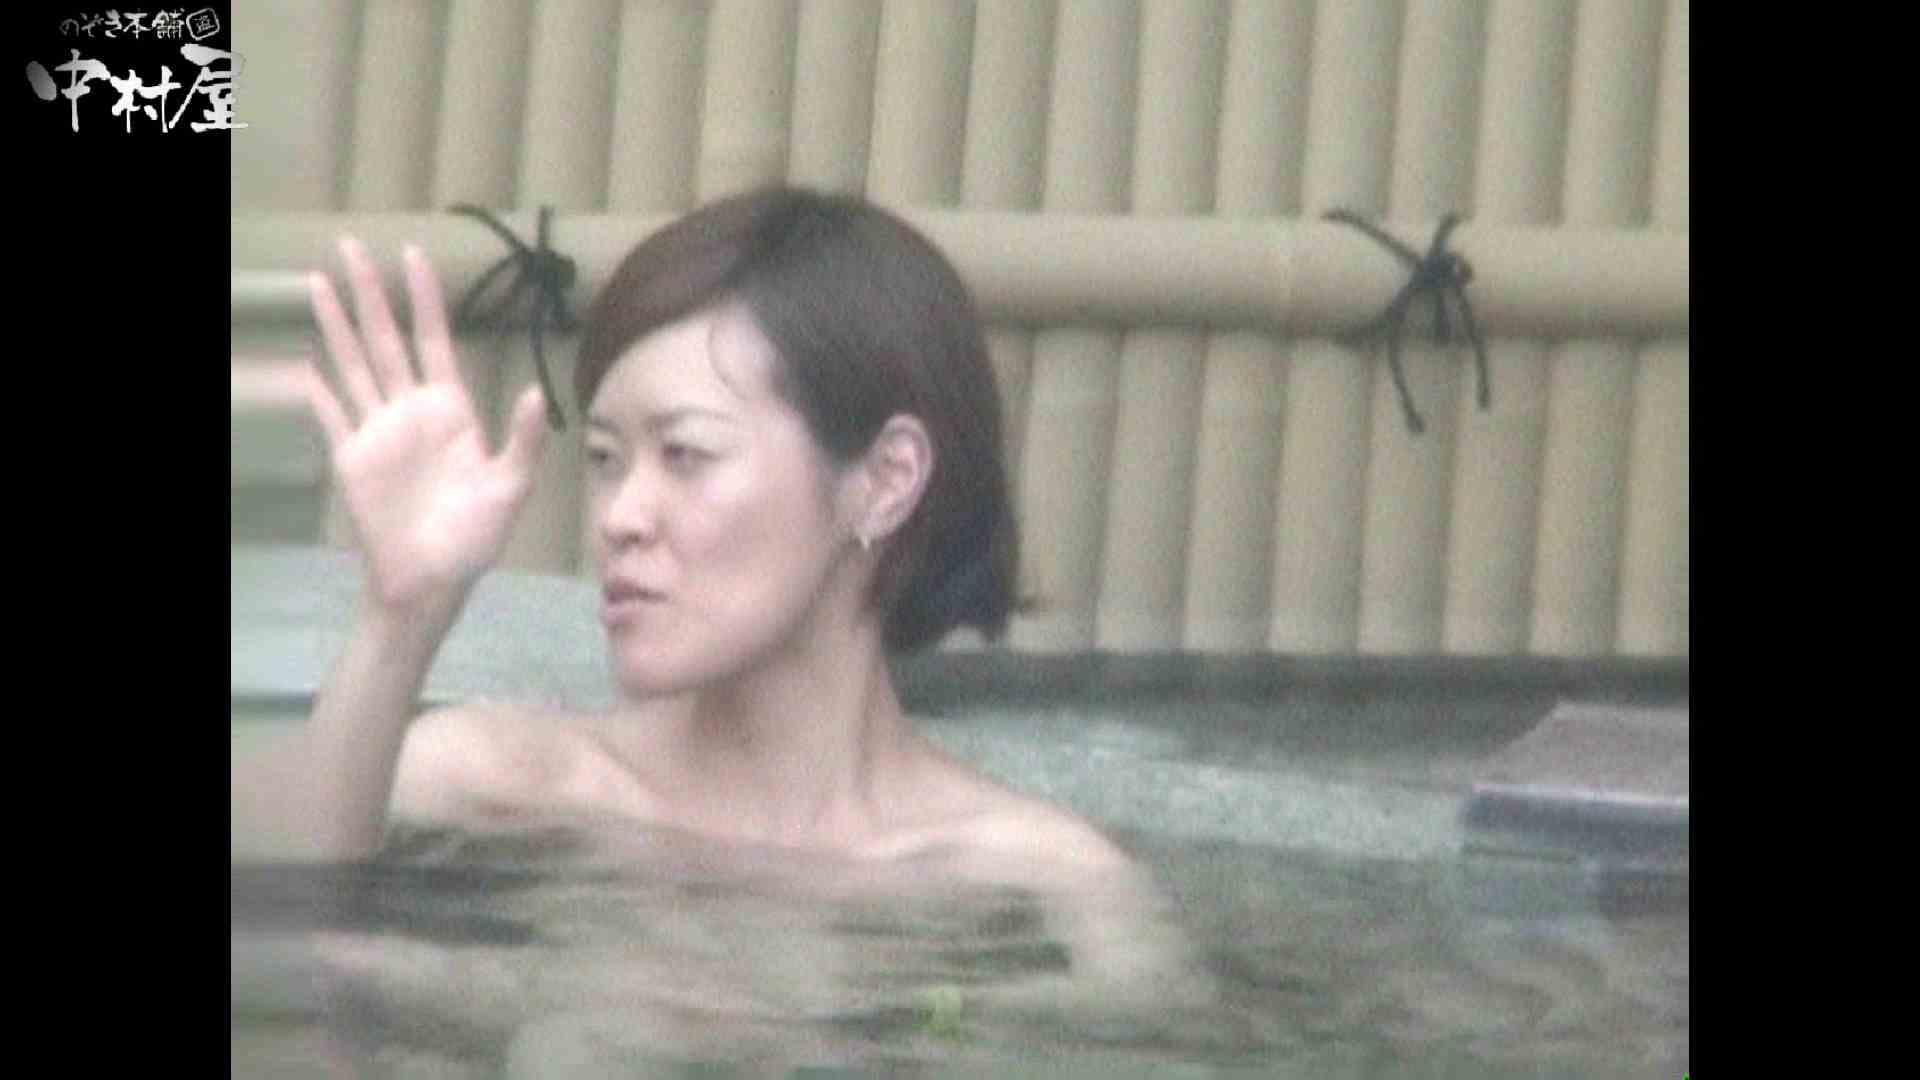 Aquaな露天風呂Vol.961 露天 盗み撮りオマンコ動画キャプチャ 65連発 23